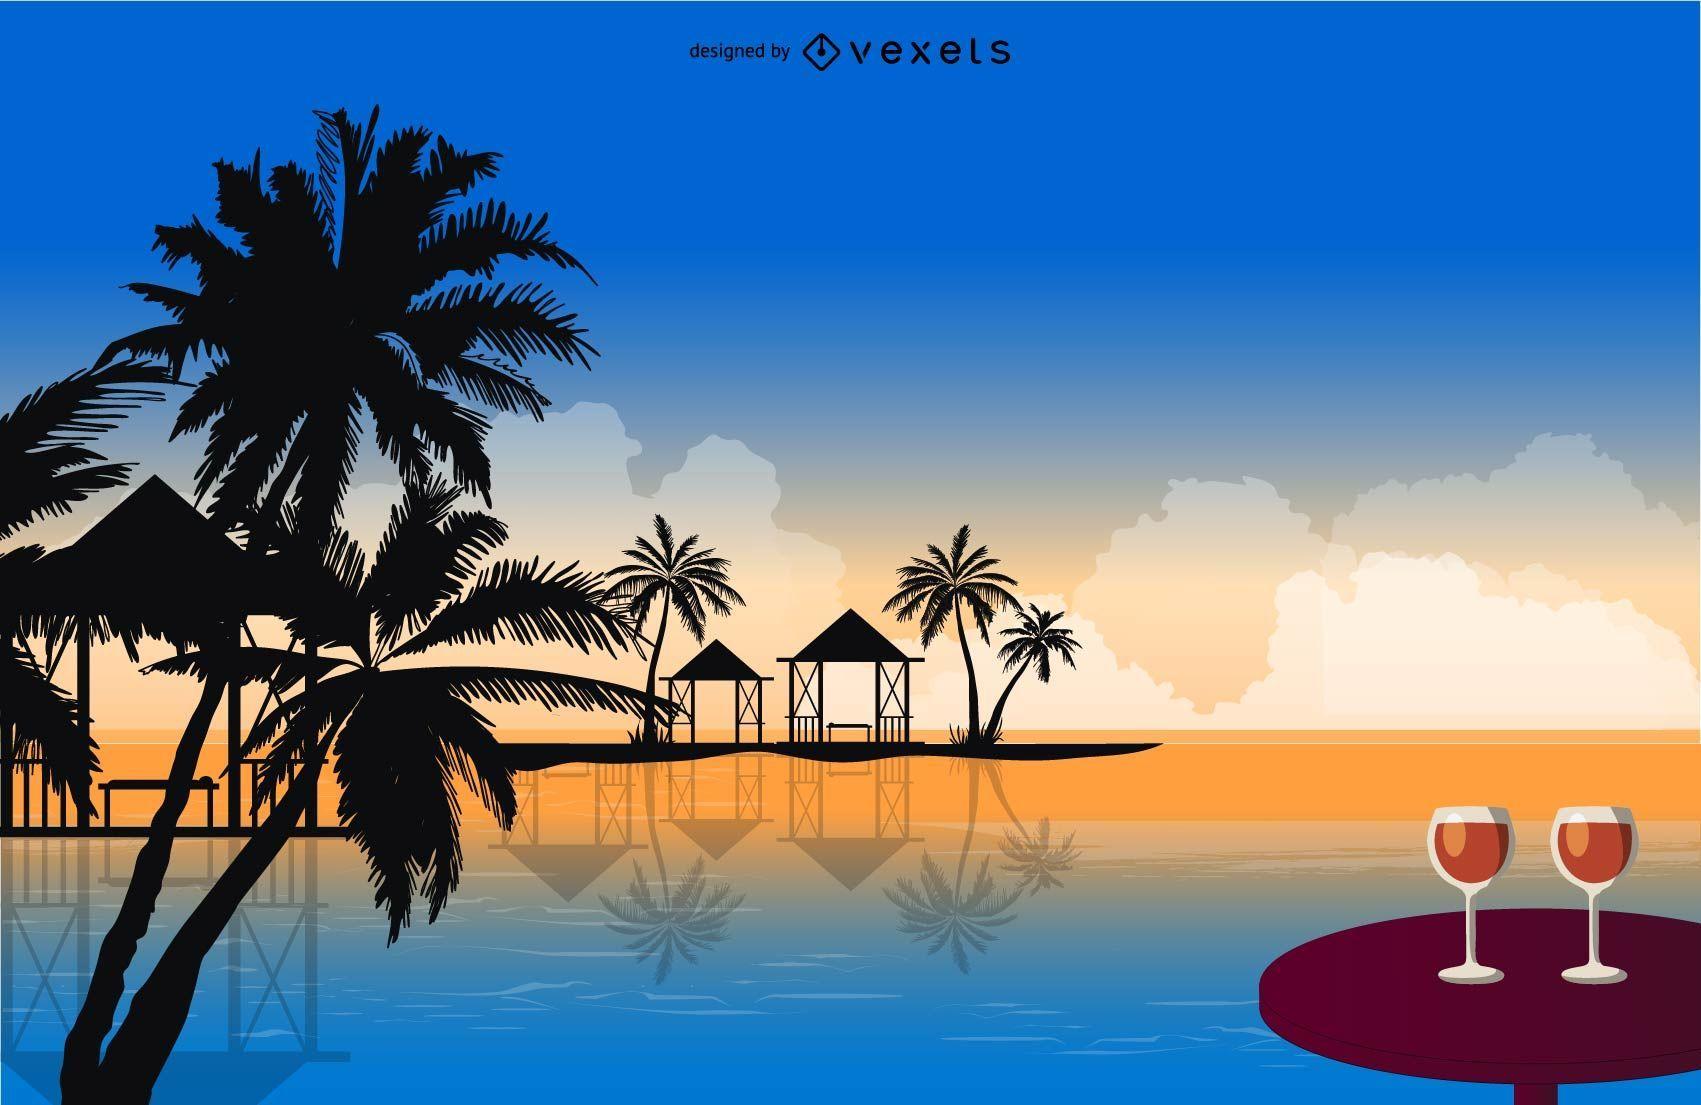 Tropical holiday illustration design